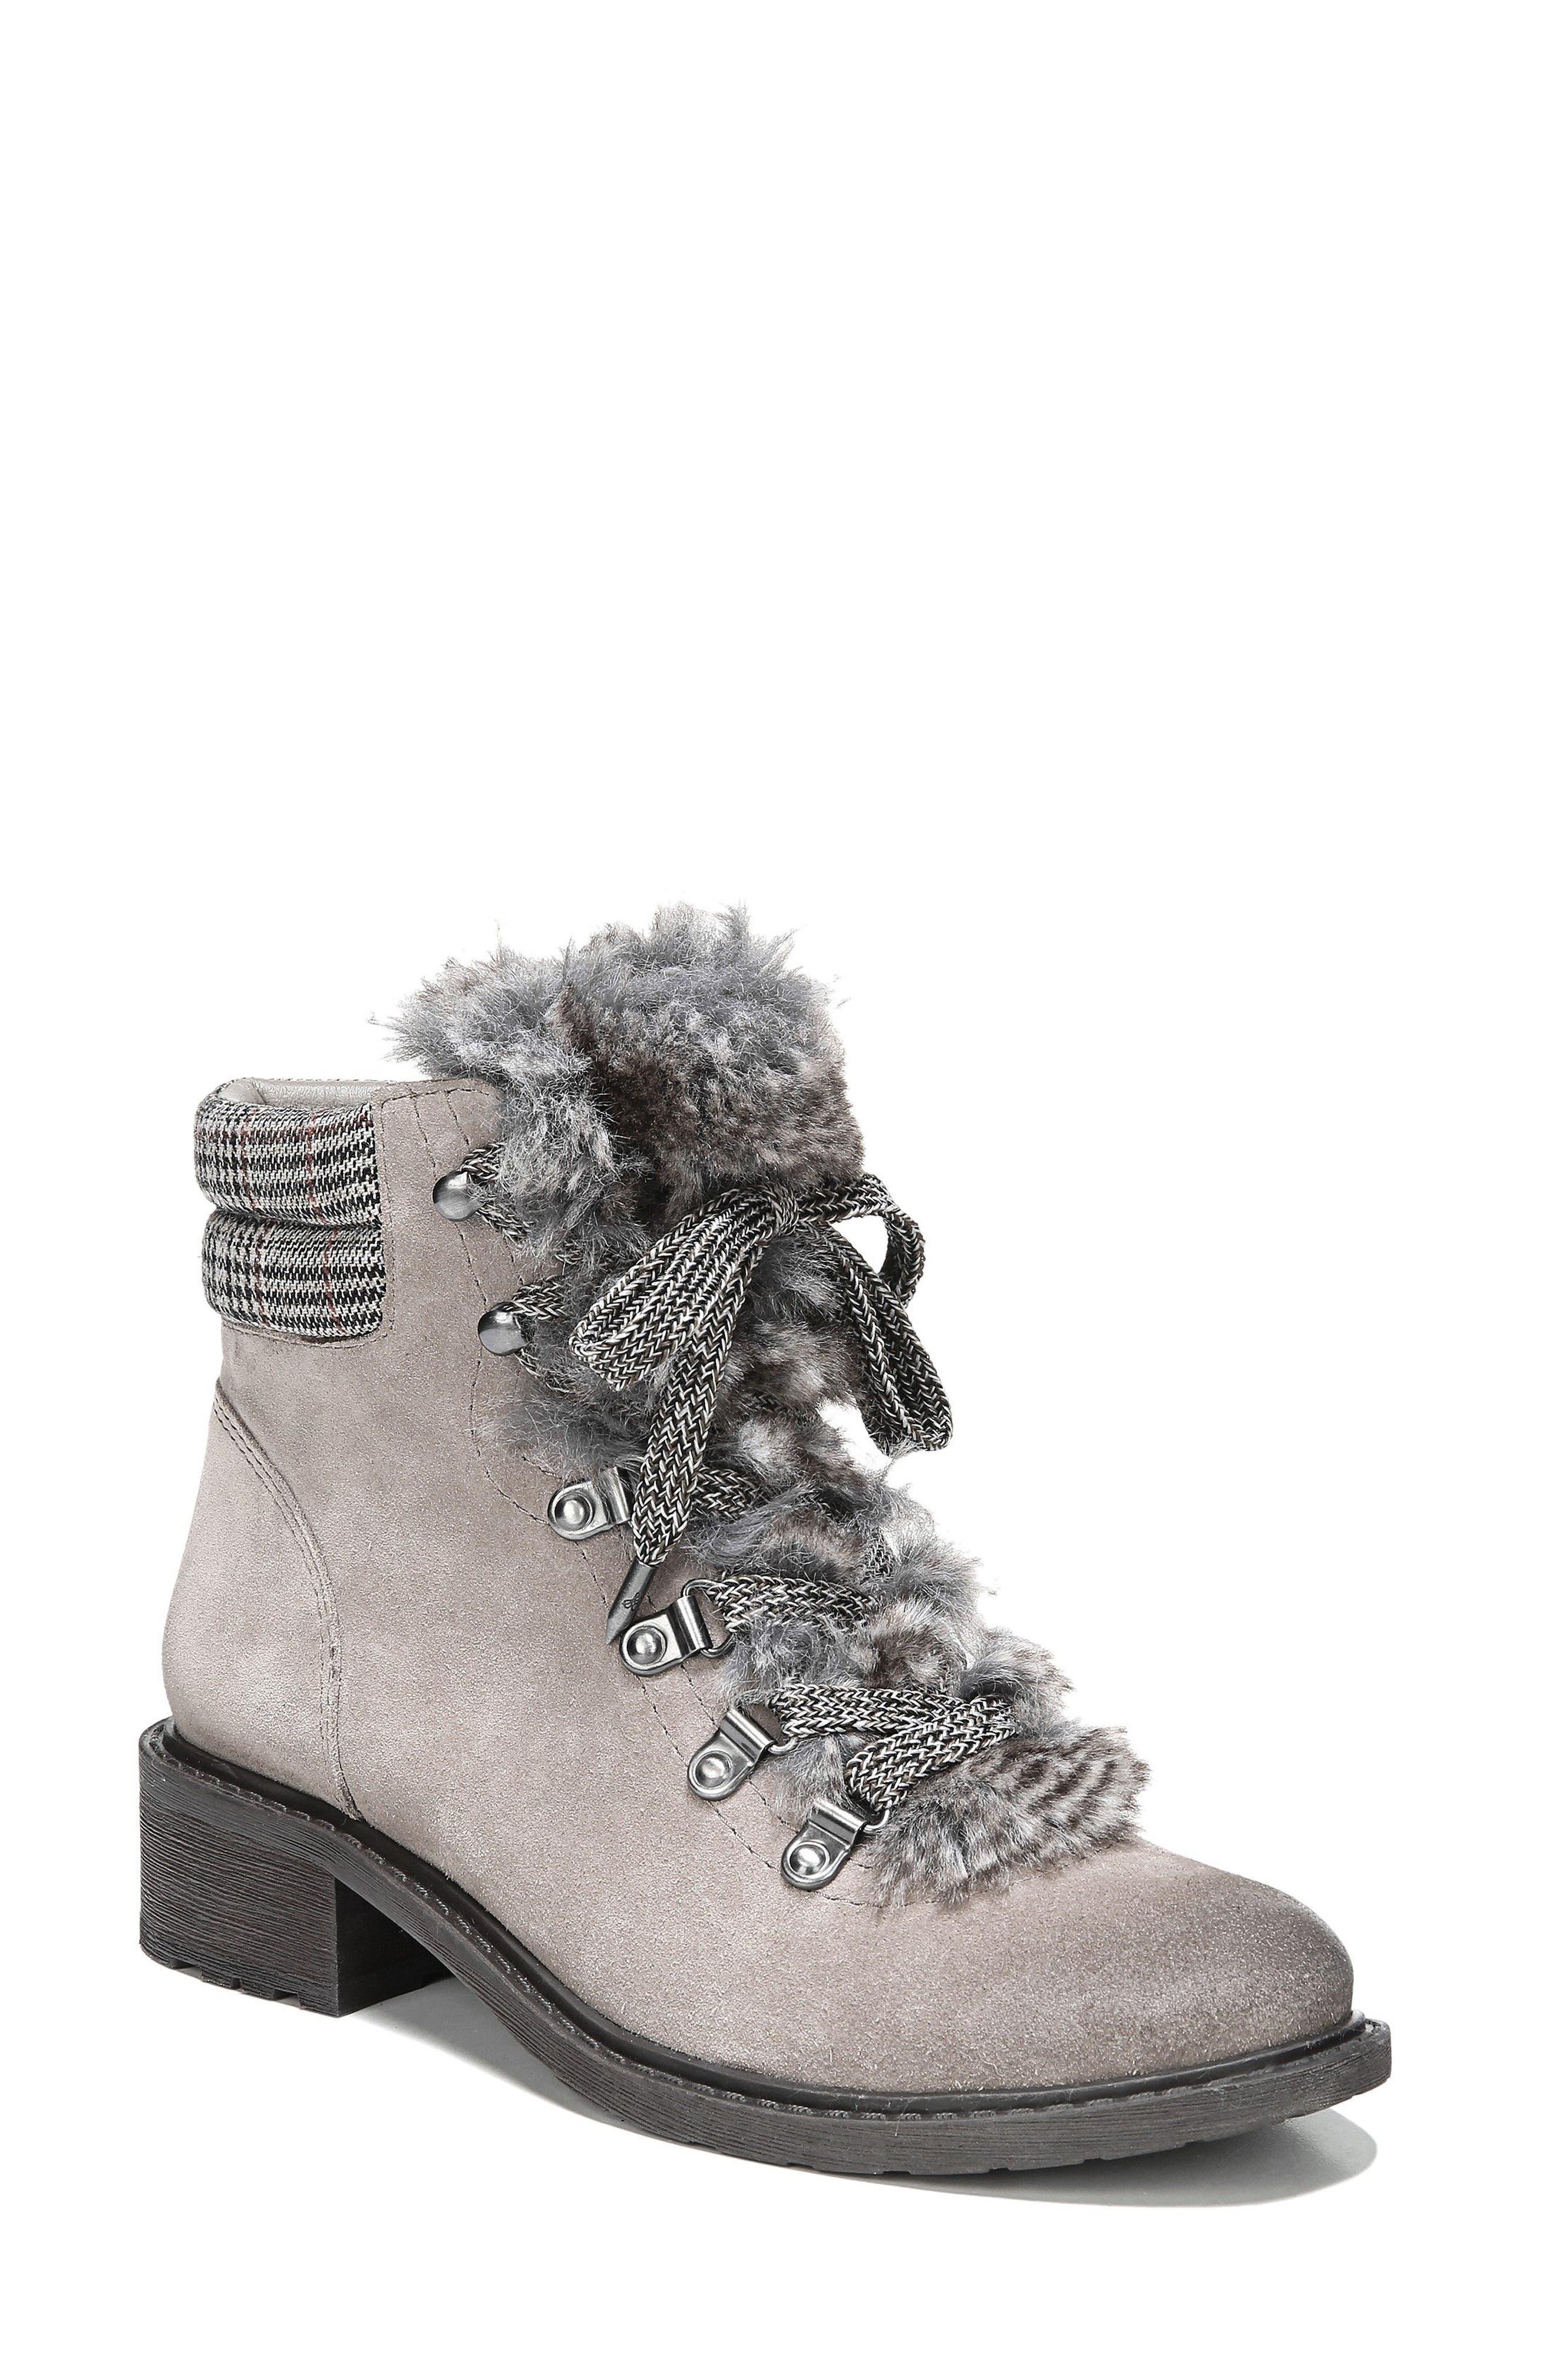 Darrah 2 Faux Fur Trim Boot,                             Main thumbnail 1, color,                             Grey Multi Suede